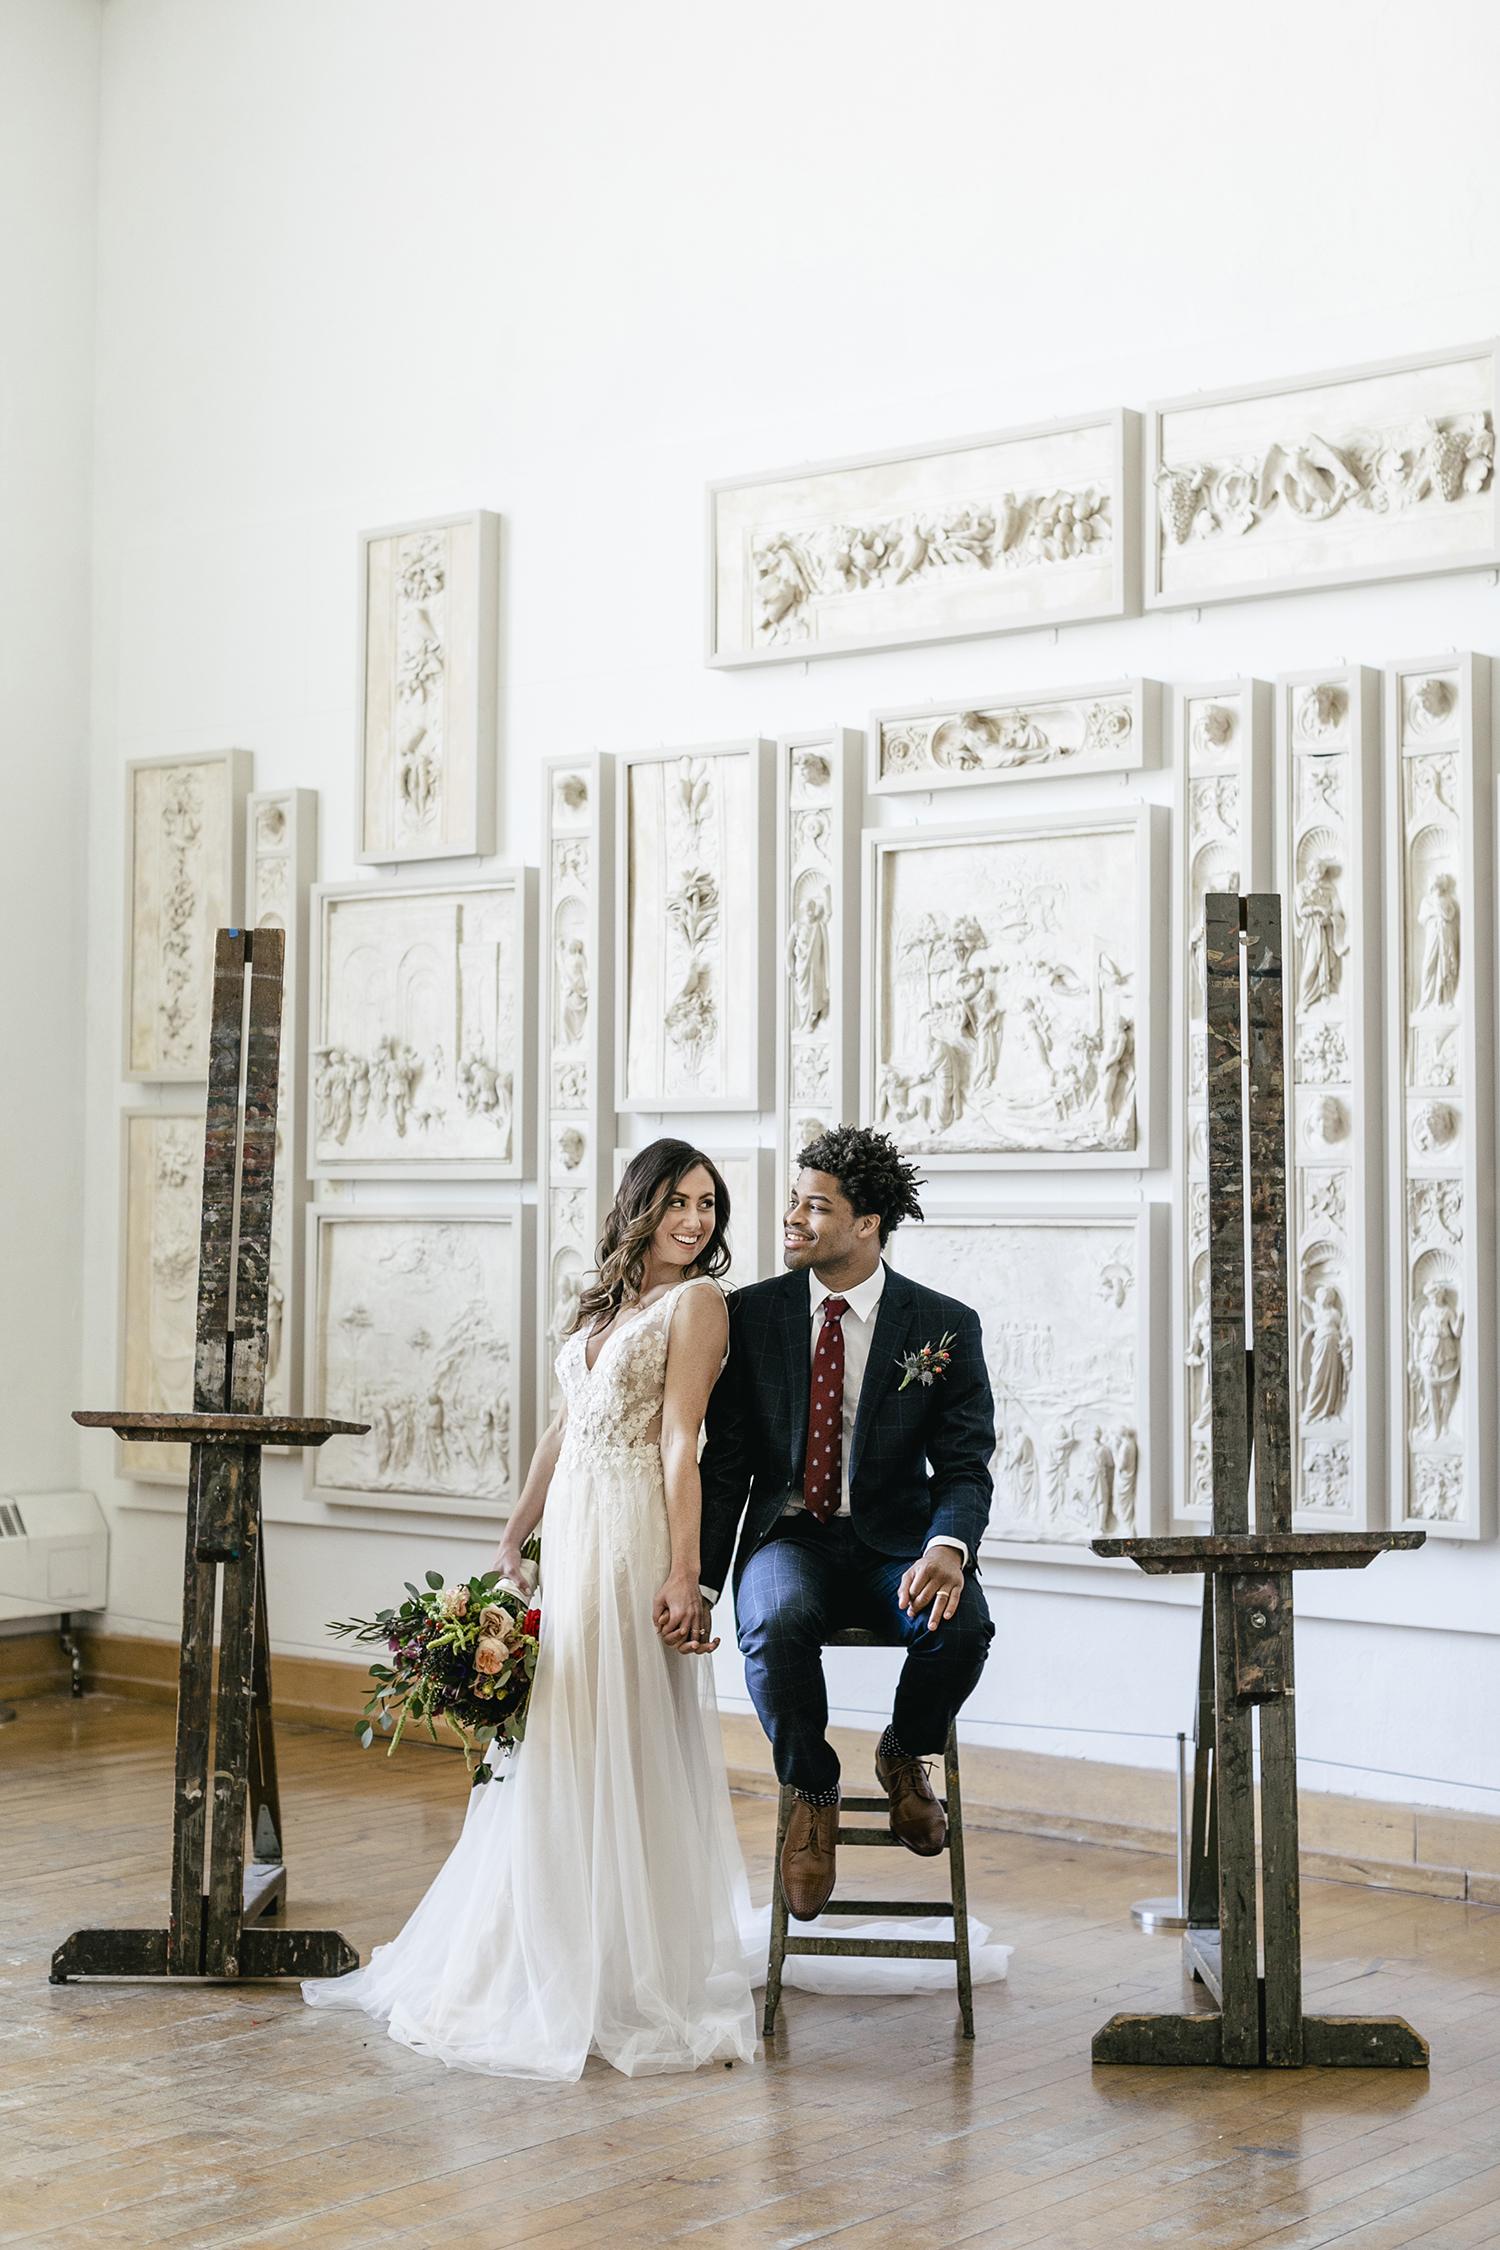 photography-wedding-weddings-natural-candid-pafa-pennsylvania academy-philadephia-philly-philadelphia wedding-mixed race-editorial-modern-fine-art-002.JPG